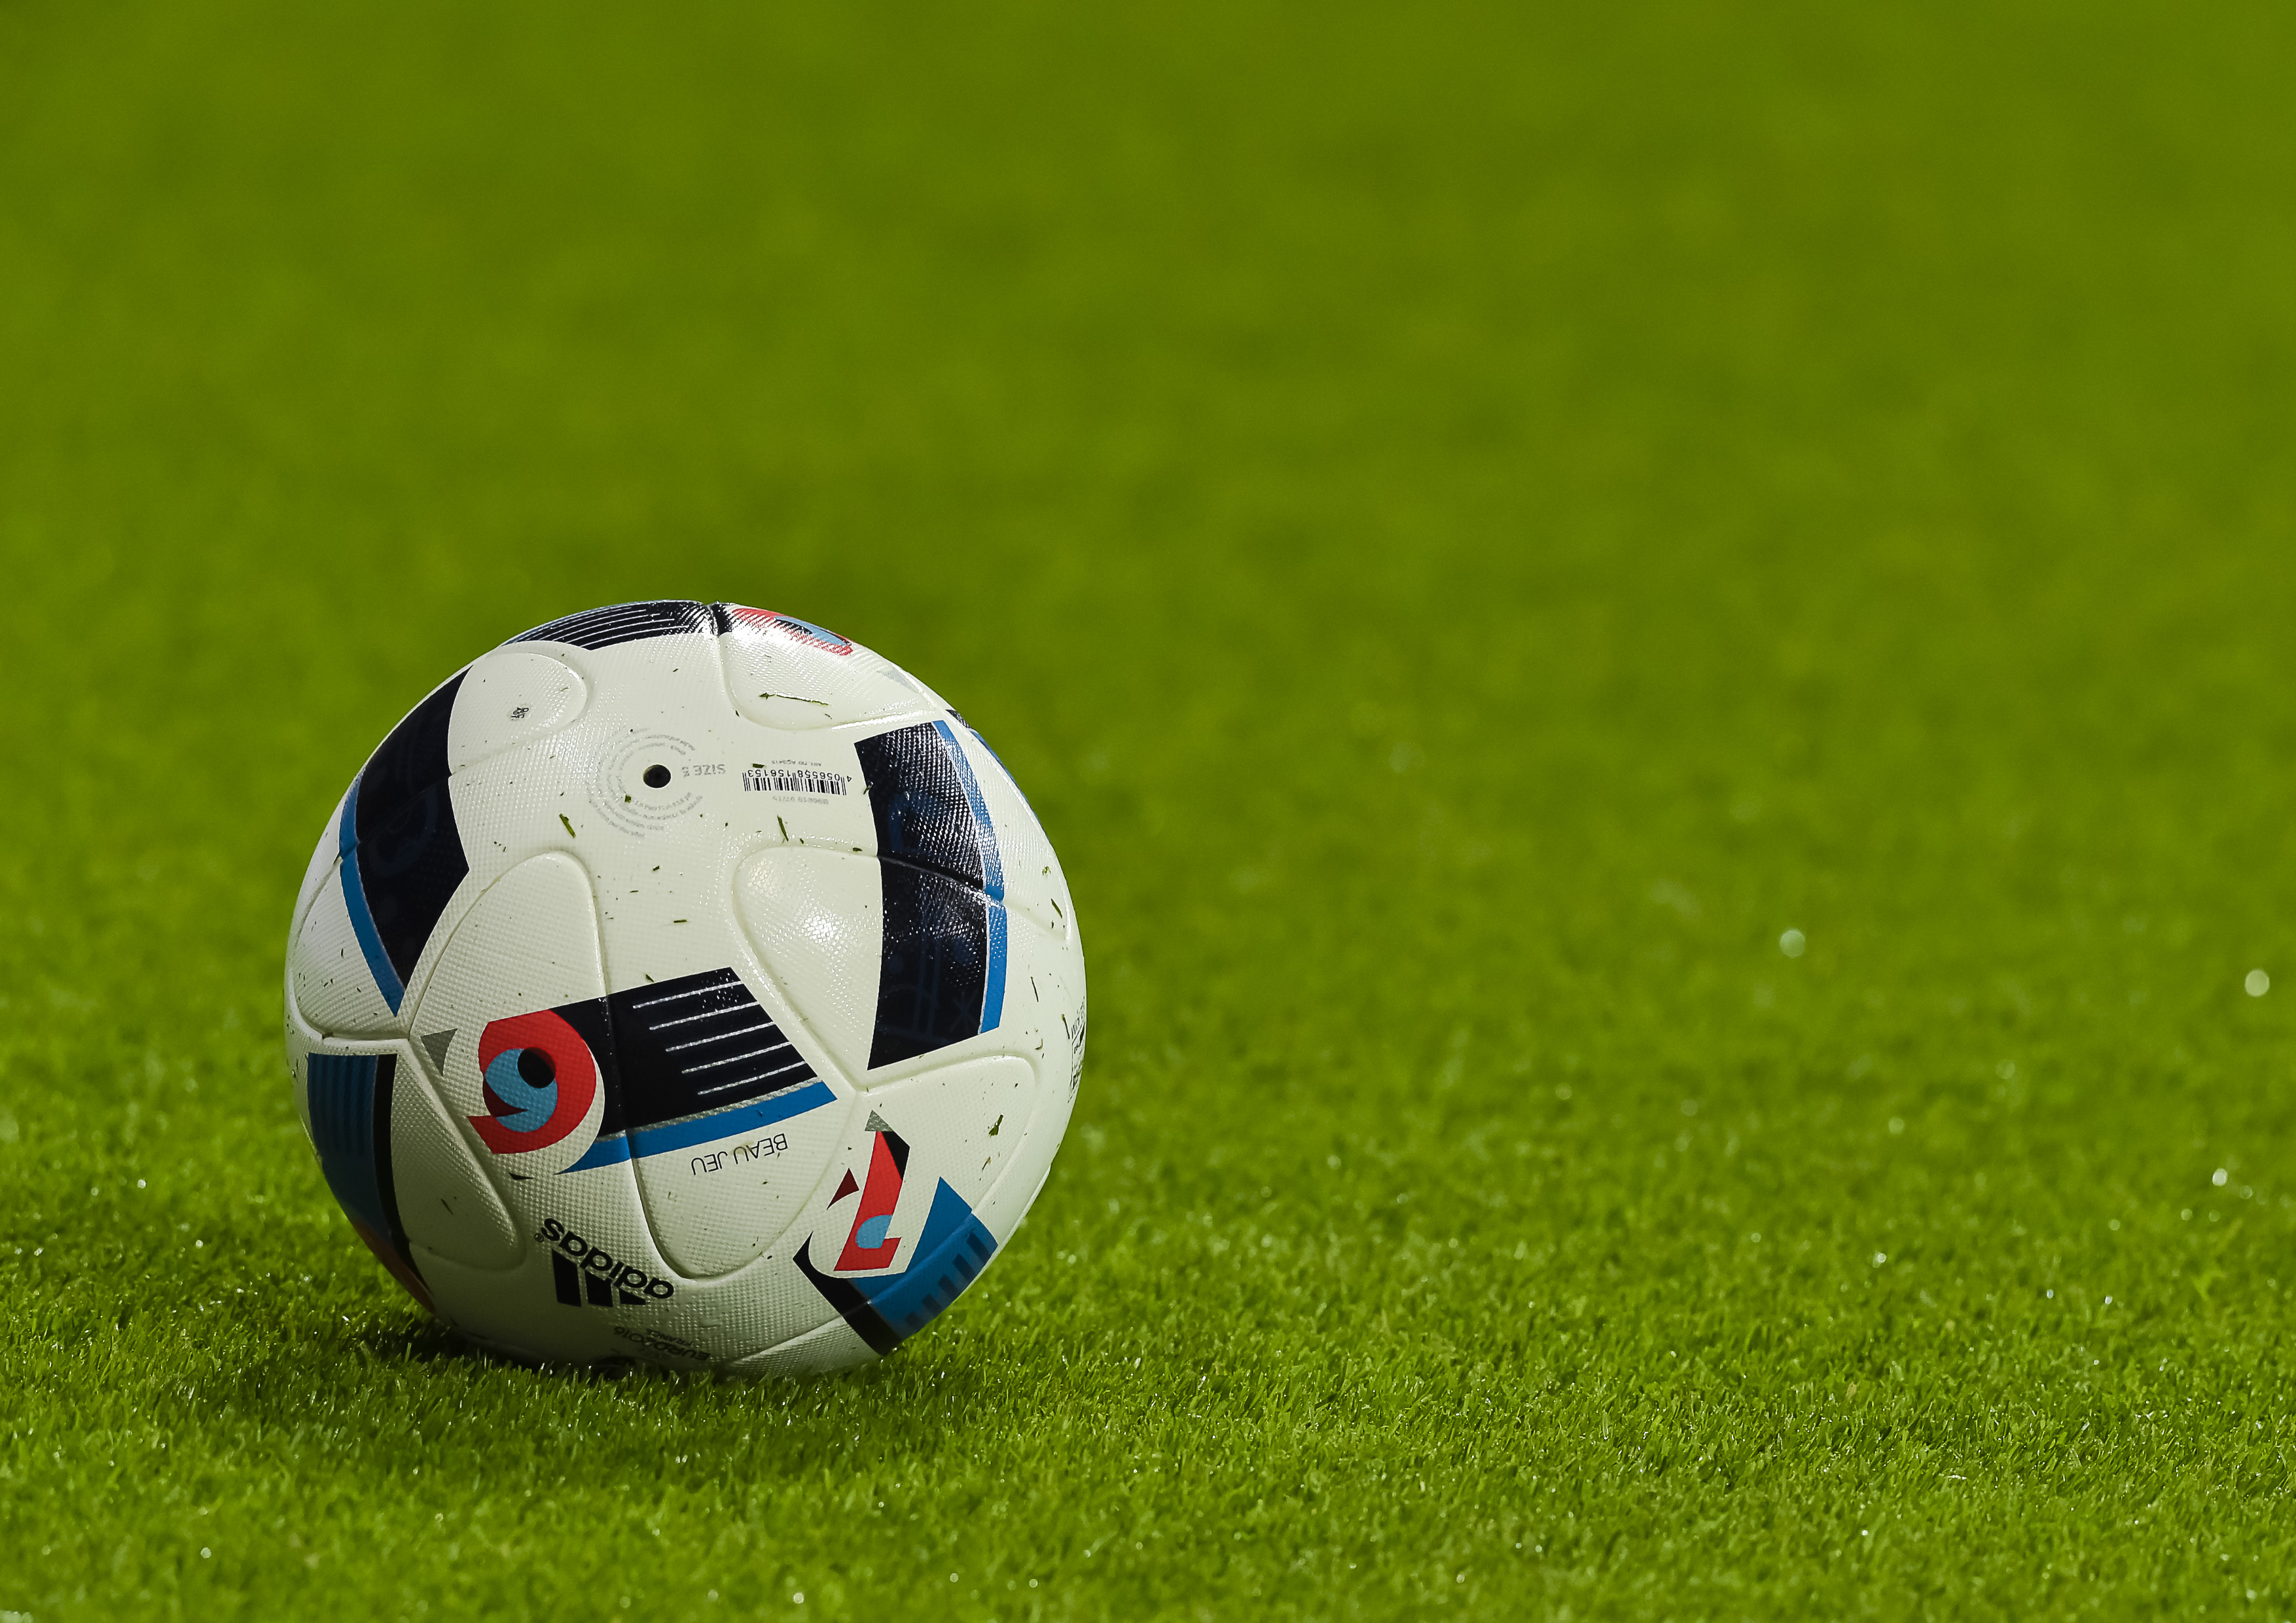 Fussball Laenderspiel Deutschland gegen Italien